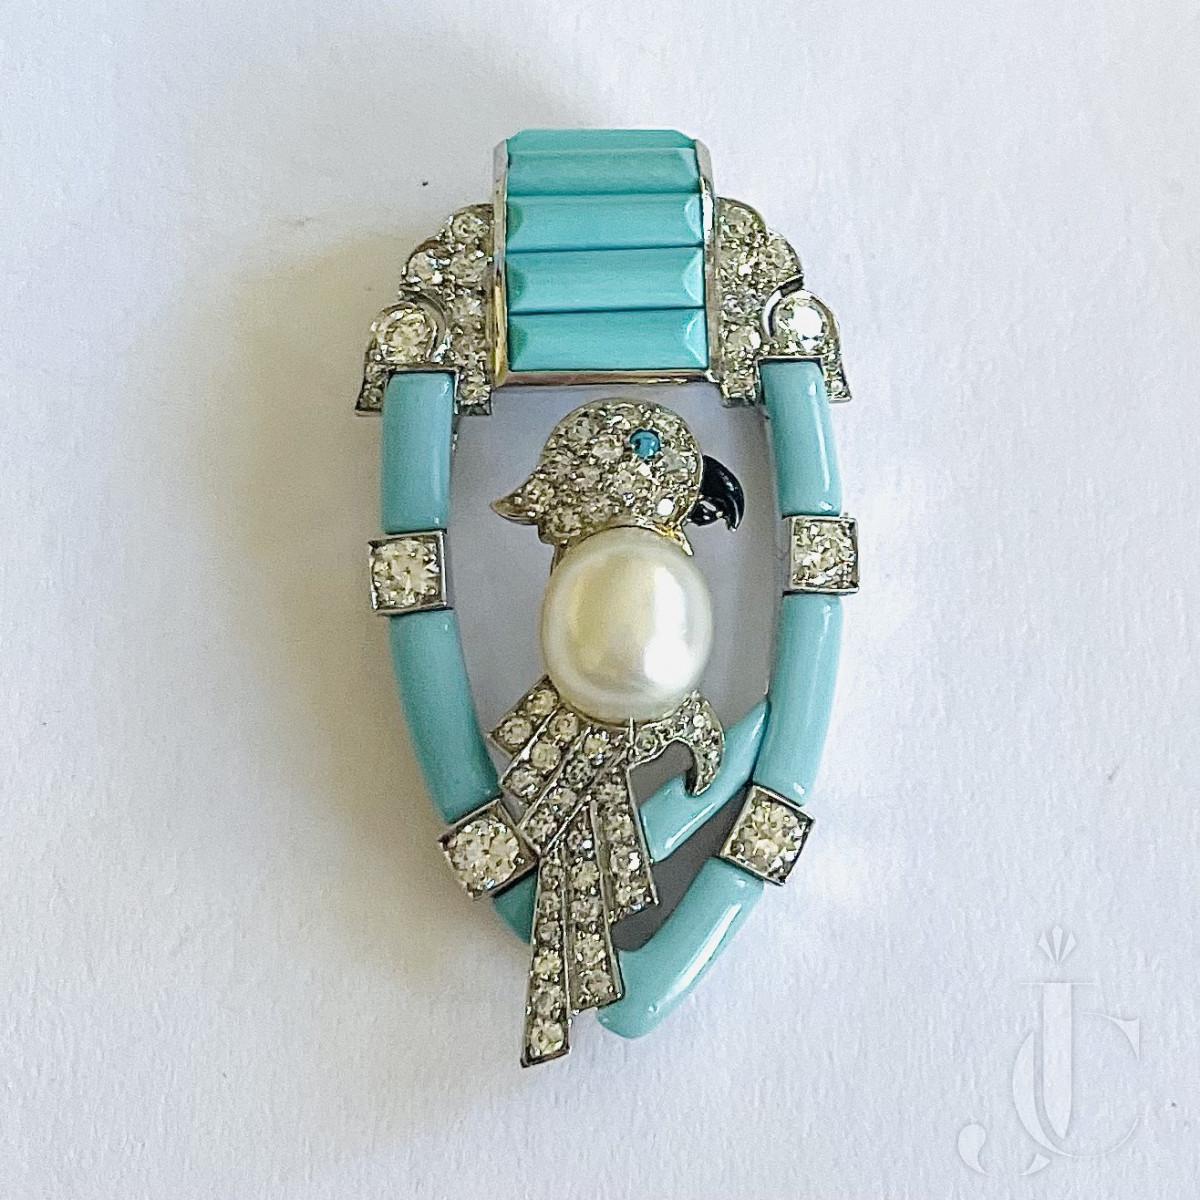 Cartier Art Deco Clip